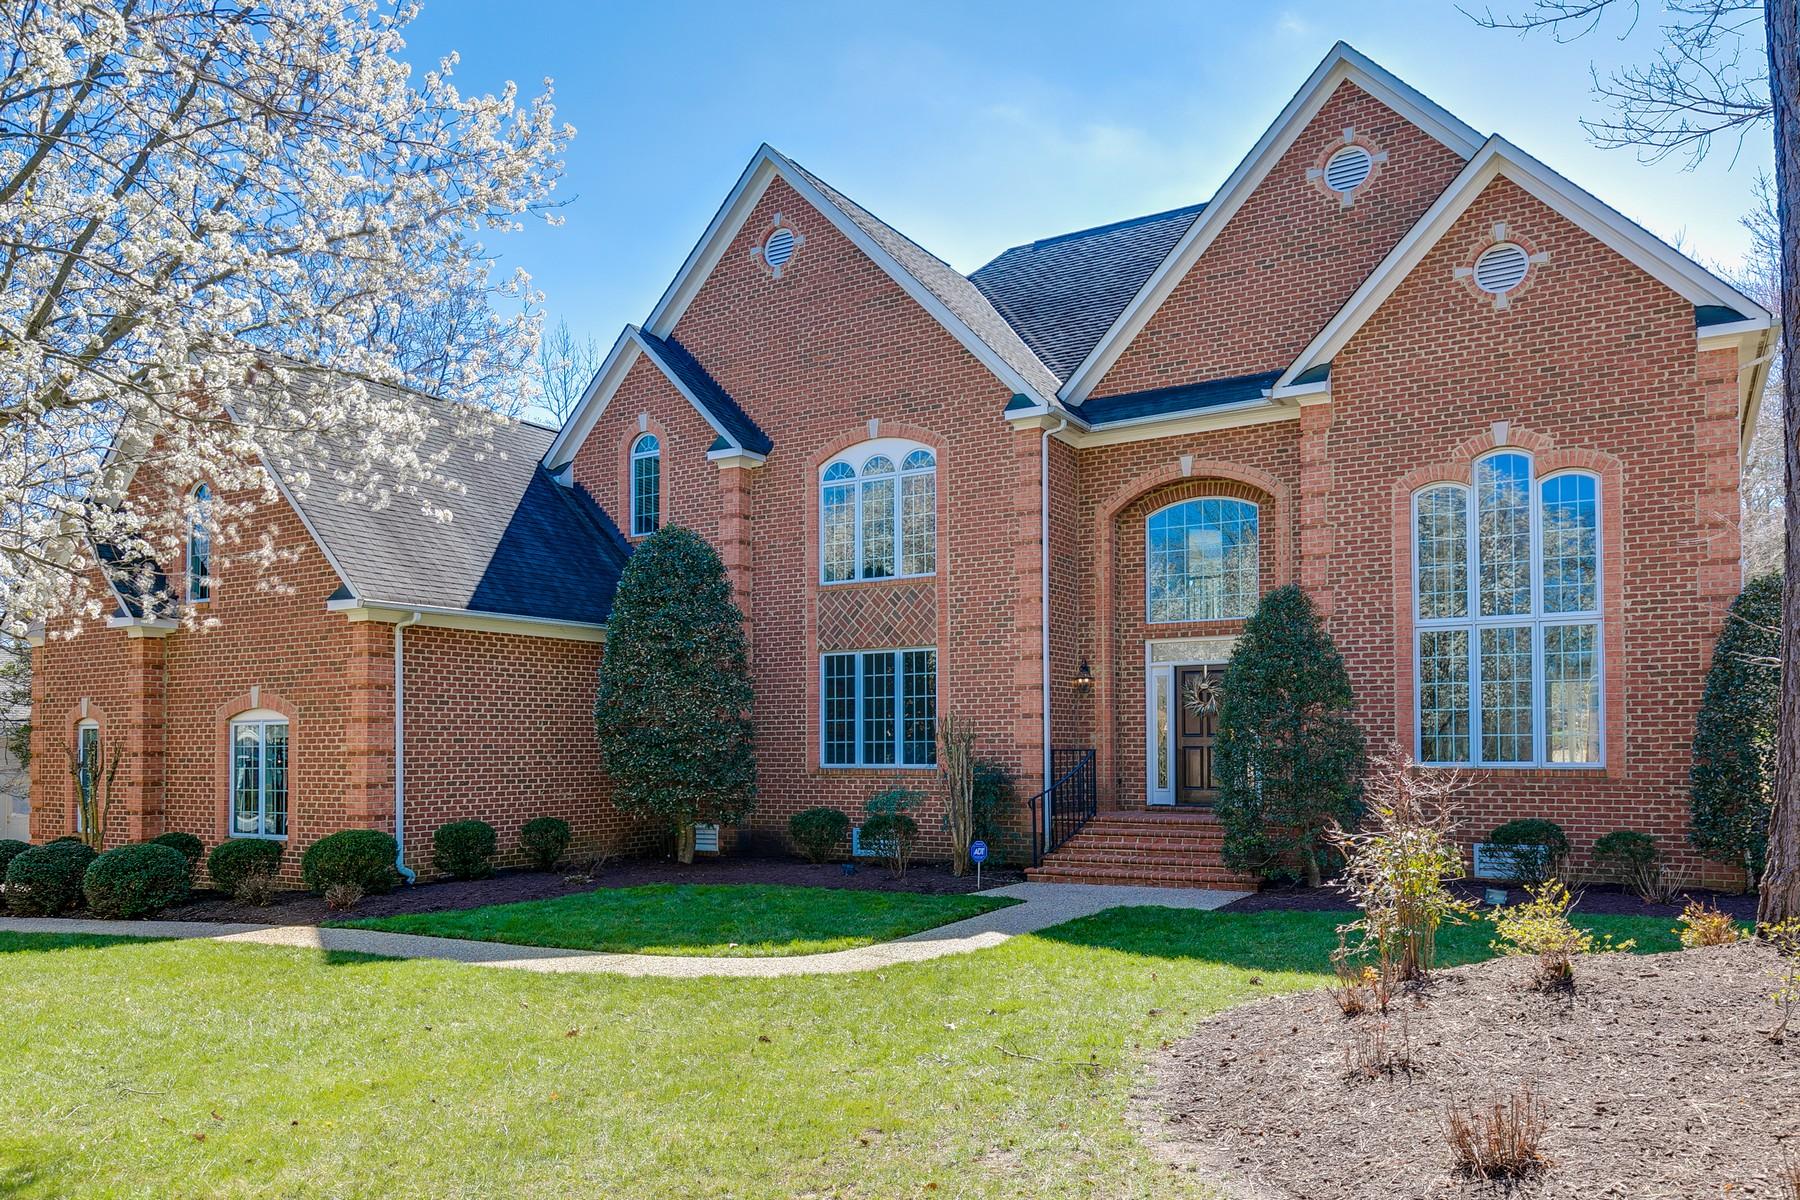 Single Family Home for Sale at 10833 Cherry Hill Drive, Glen Allen Glen Allen, Virginia, 23059 United States